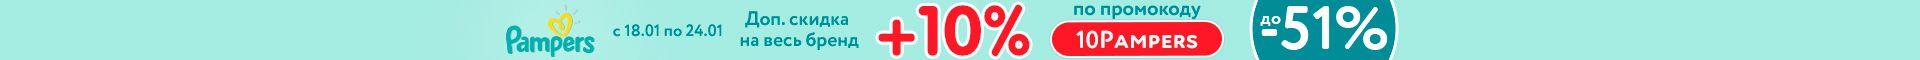 10% на Pampers по промокоду 10Pampers сквозной